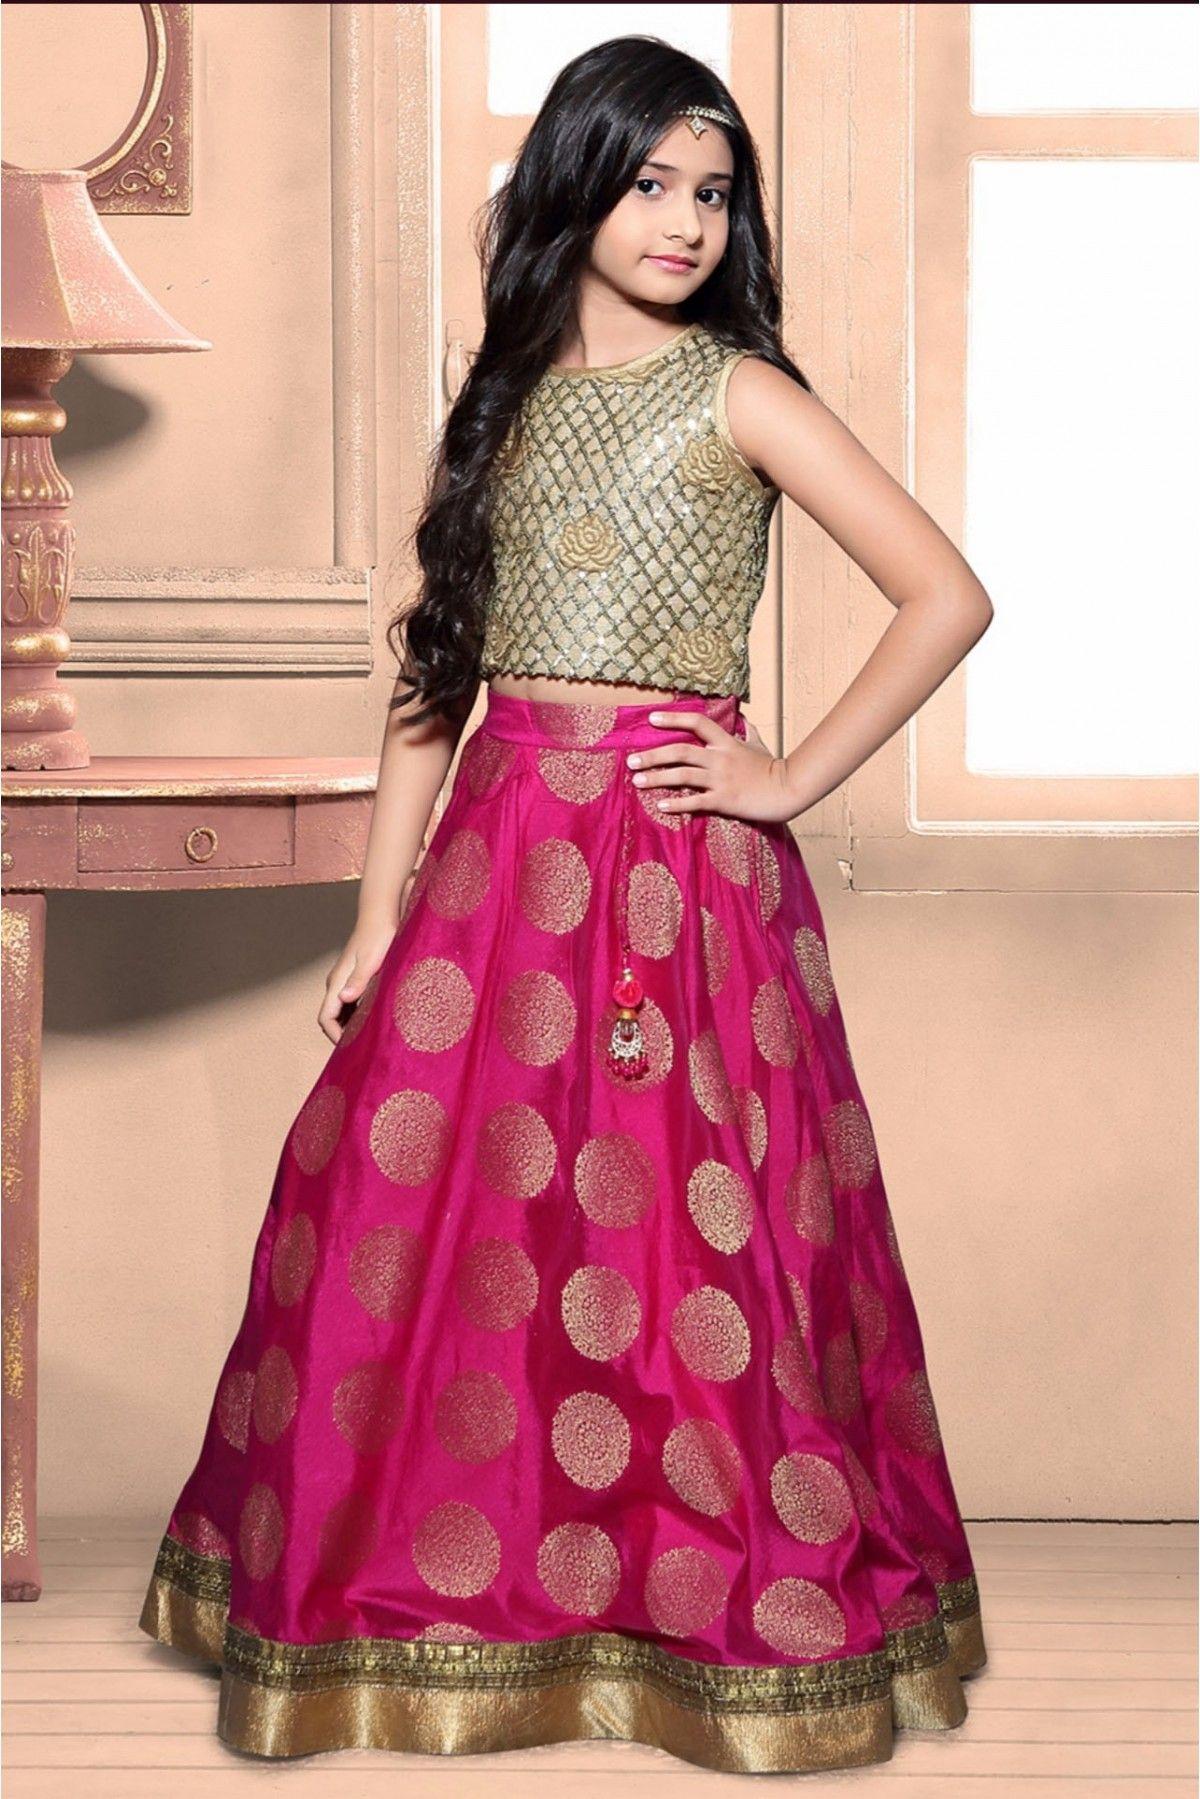 Banarasi and brocade party wear lehenga choli in pink colour